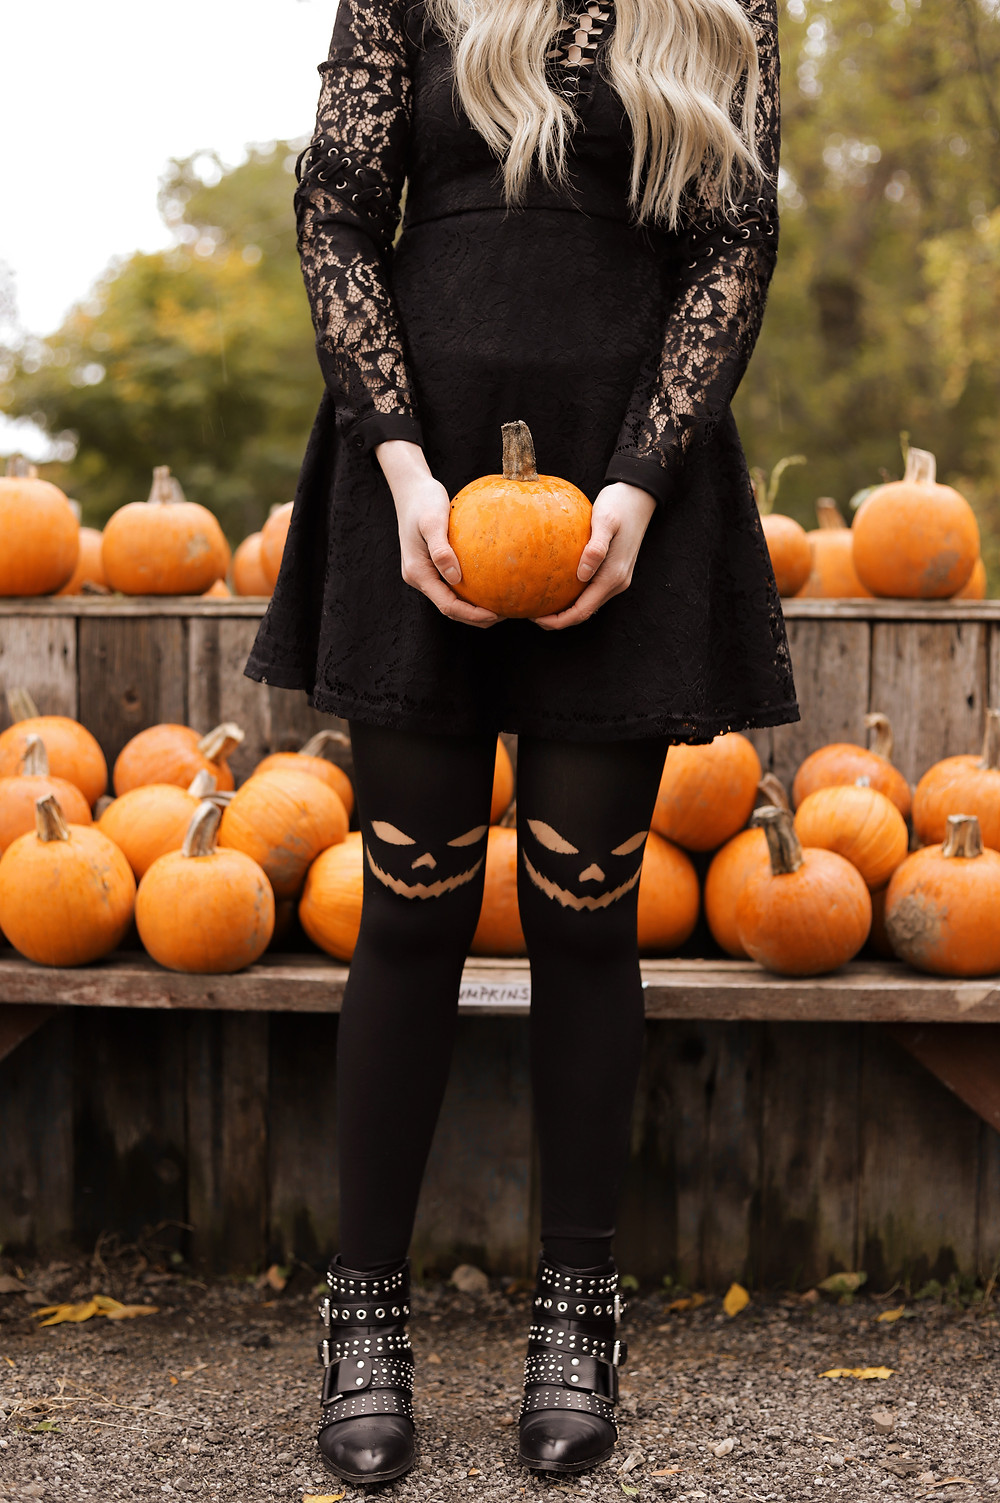 Tights, Fall Fashion, All Black Outfit, Modcloth, Bohme, DSW, Pumpkins, Fall, Fall Fashion,